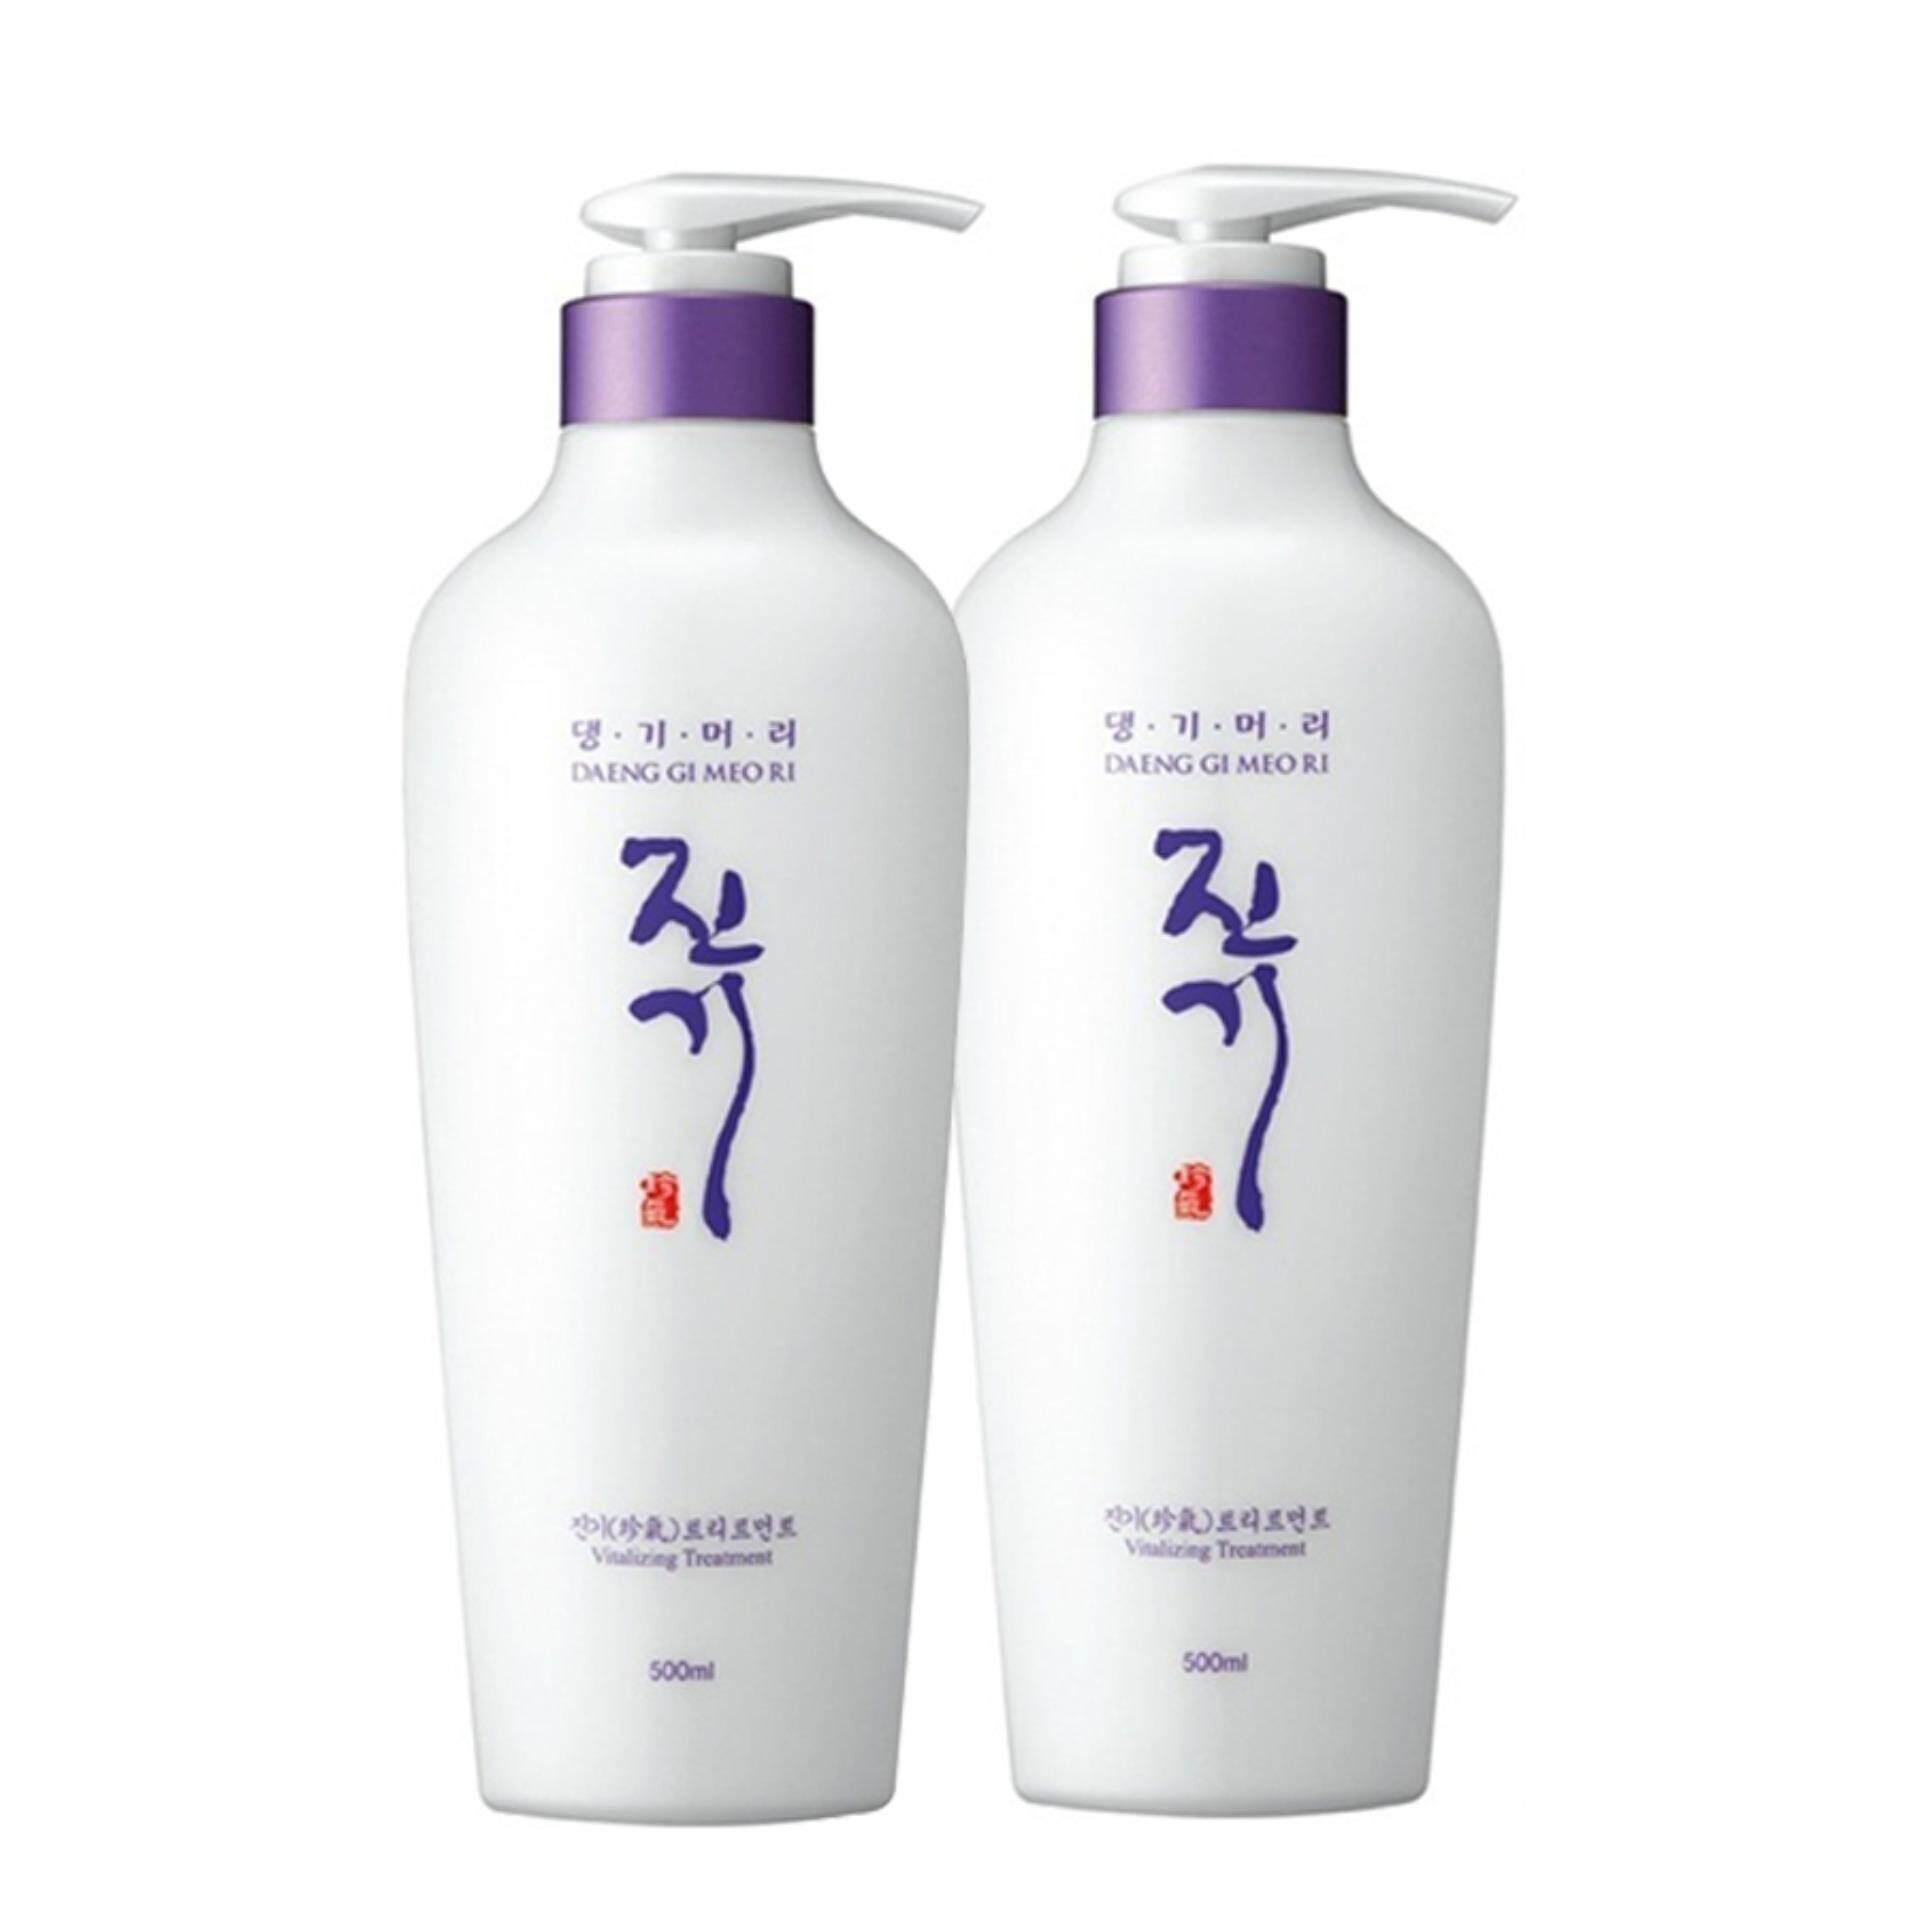 Daenggimeori treatment แทงกิโมริ ทรีทเม้นต์เกาหลี 300 ml2 ขวด